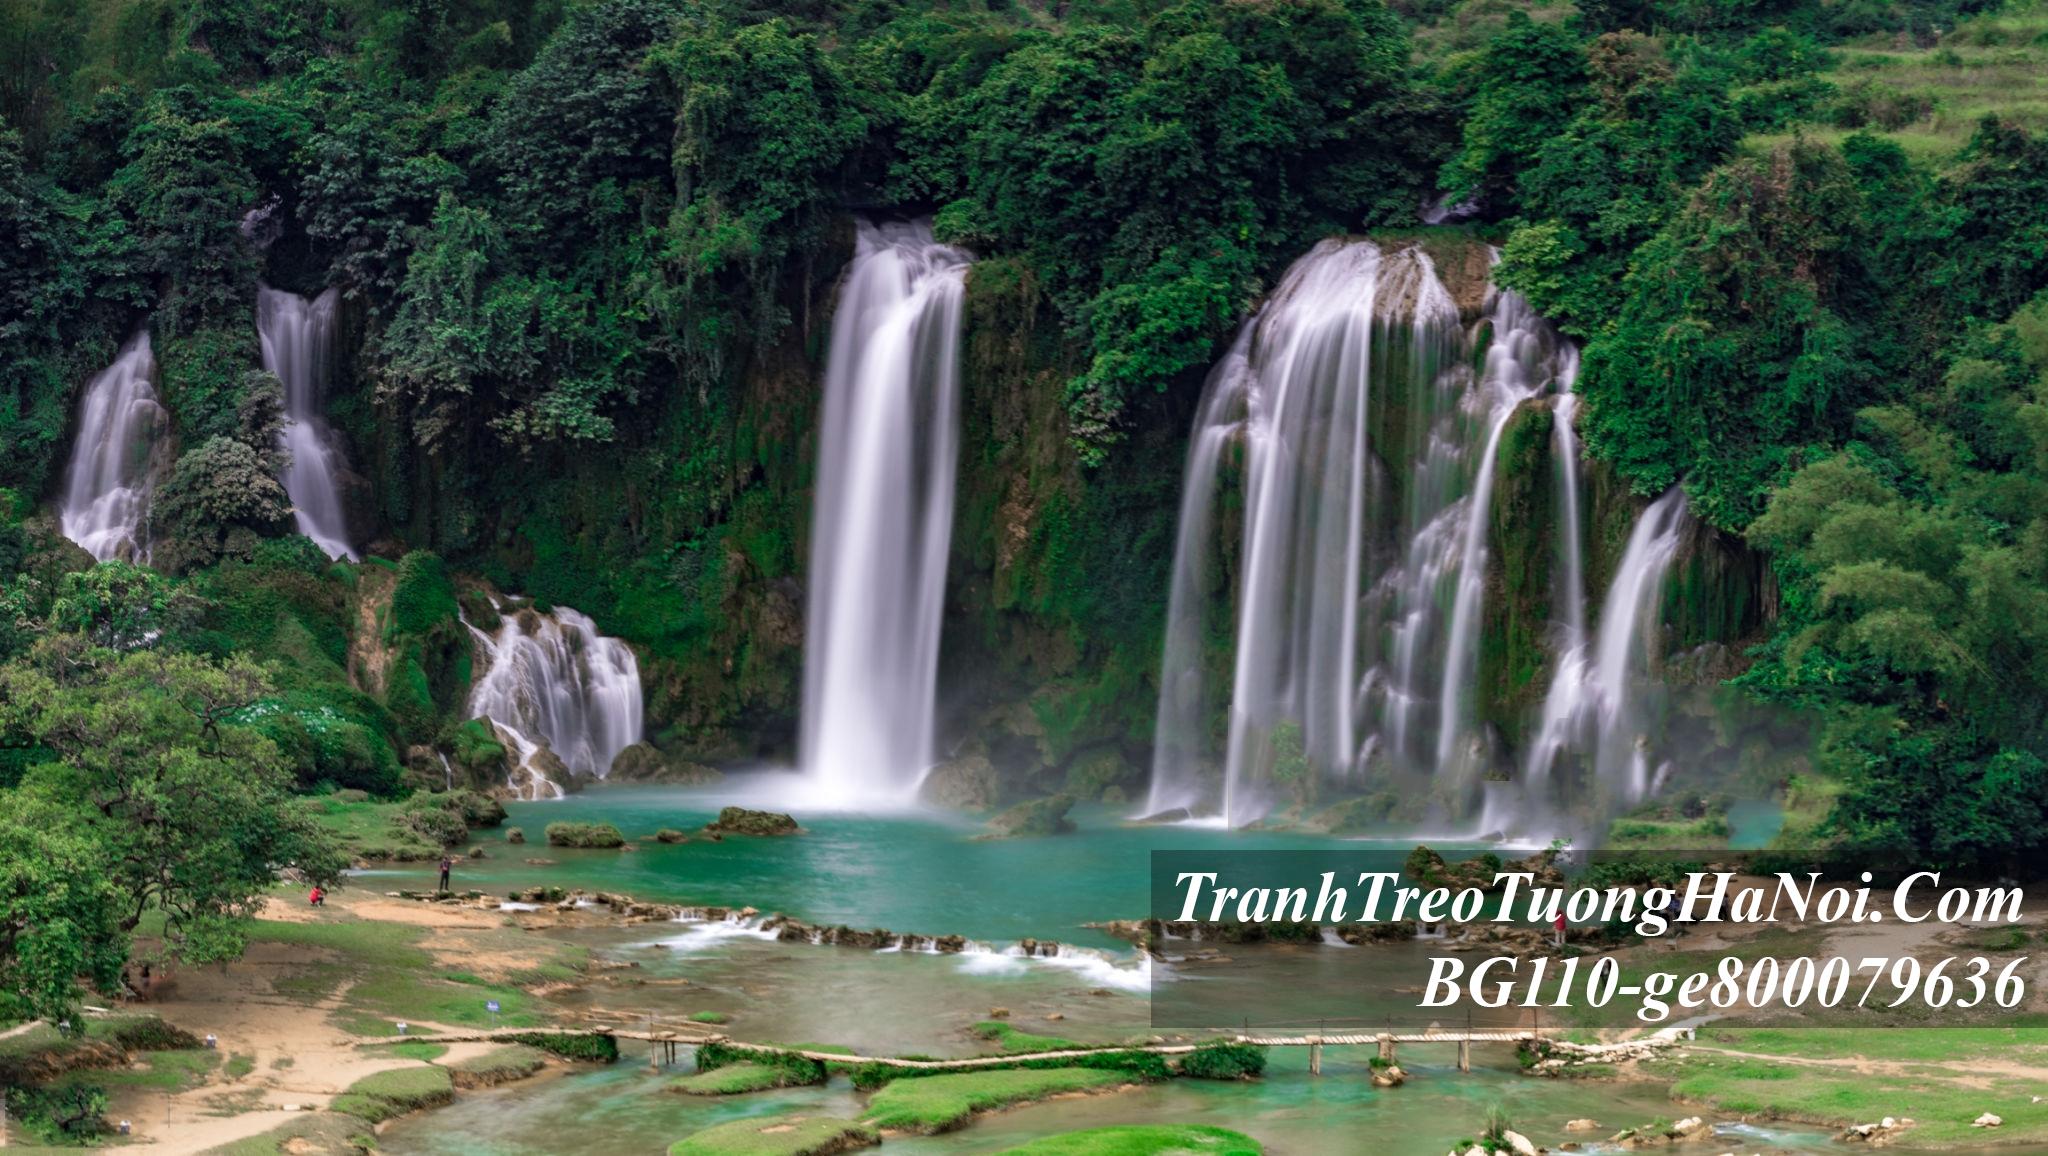 Phong canh thac nuoc dep treo phong khach amia BG110-ge800079636